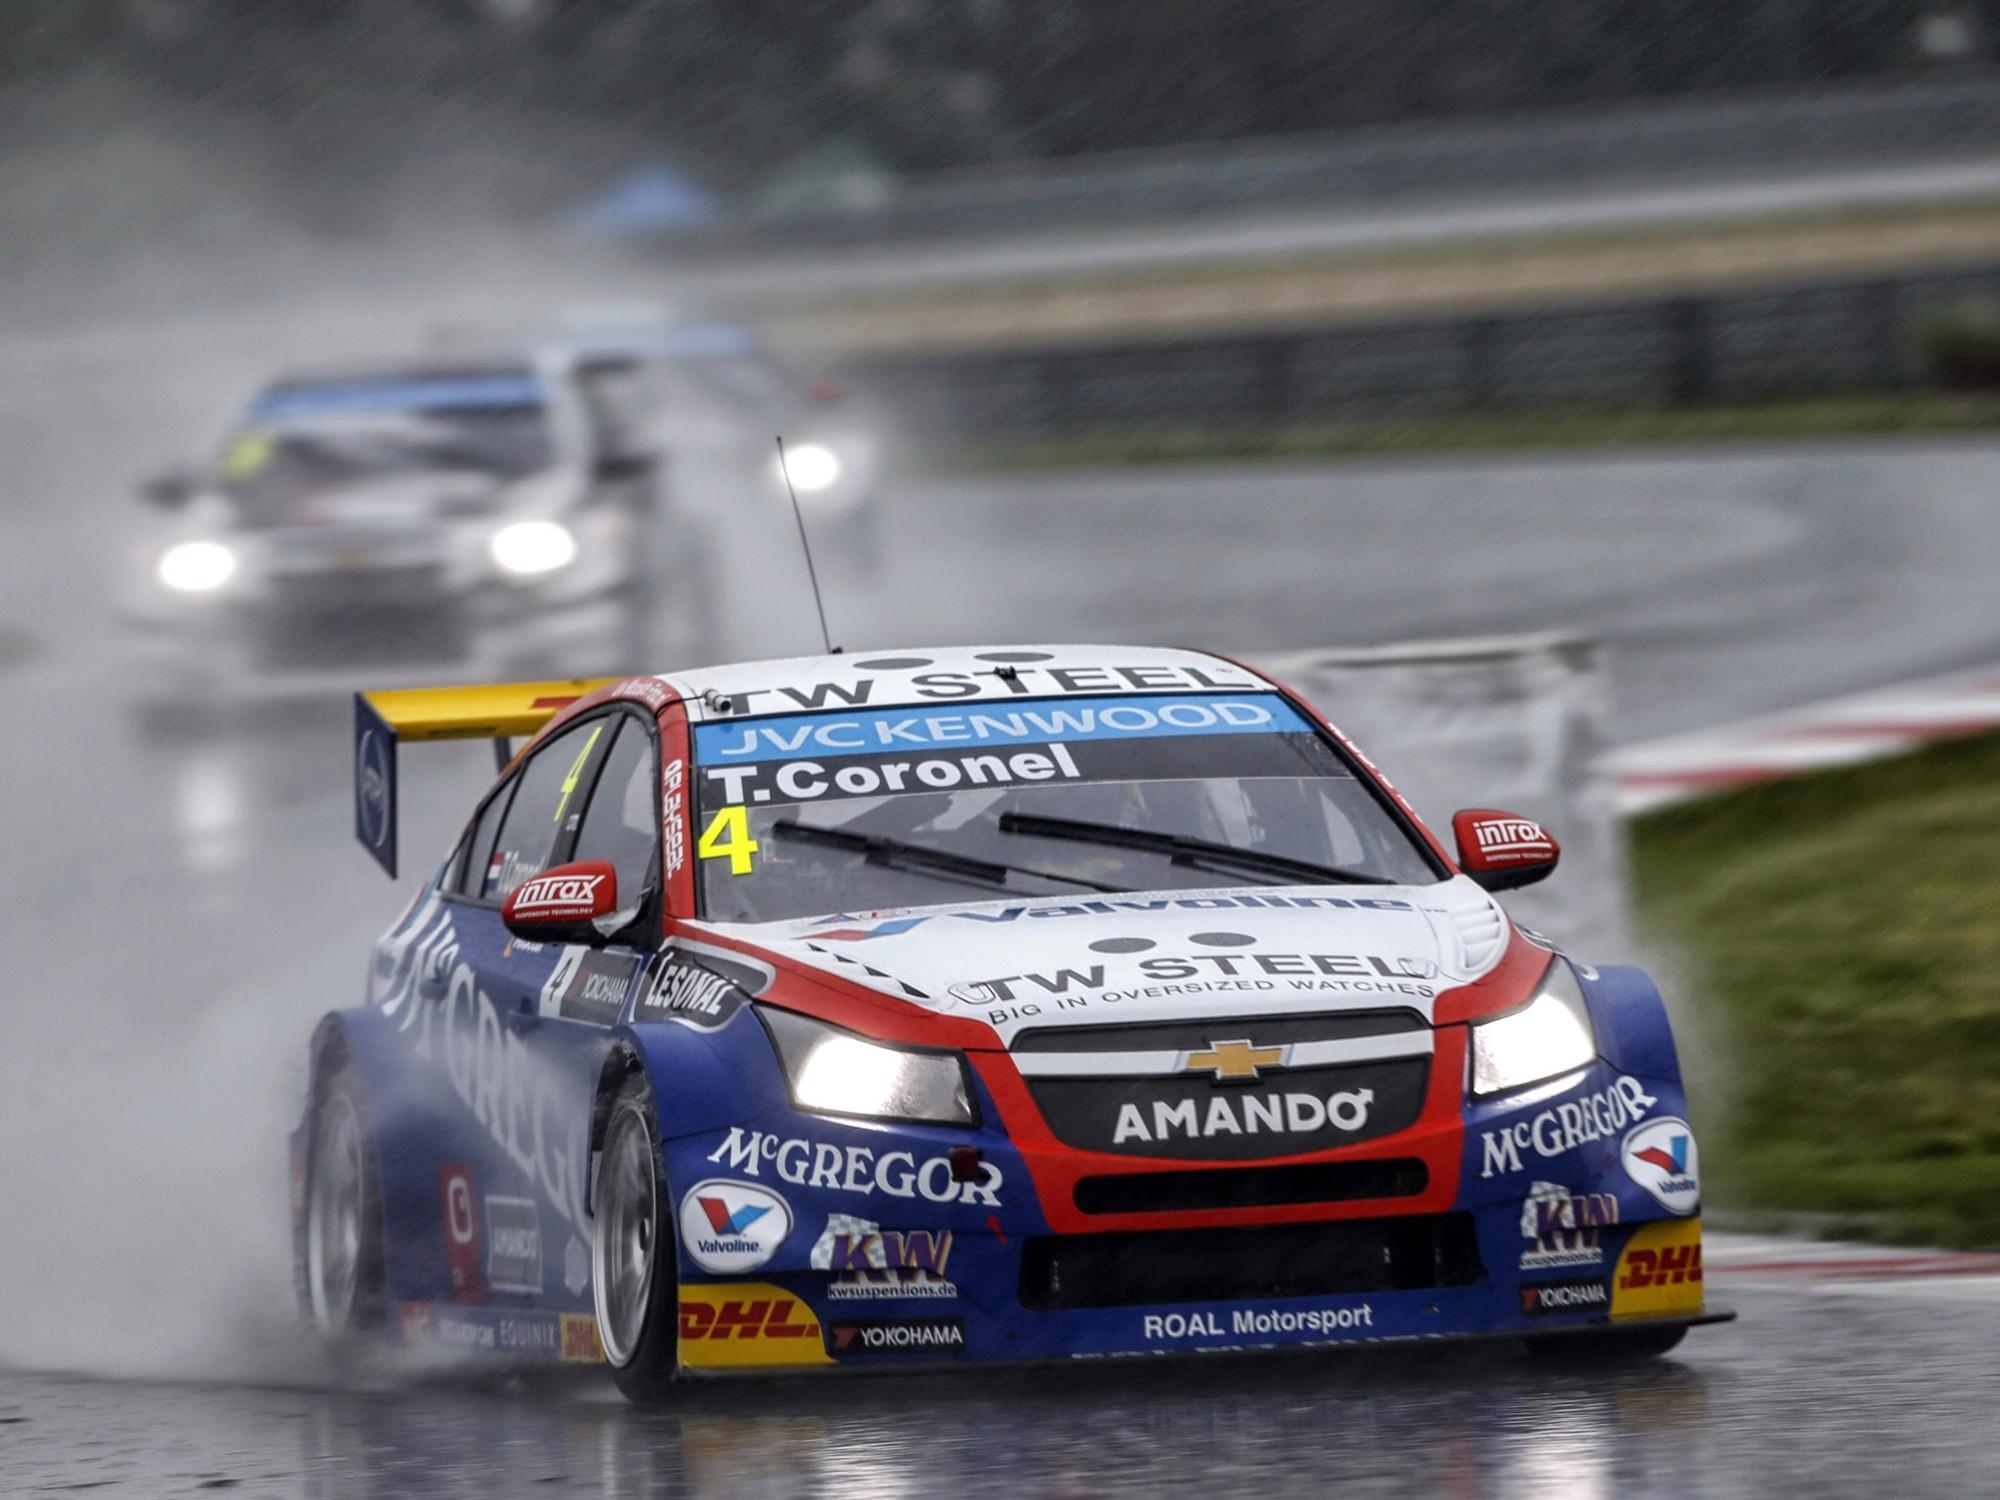 http://www.wallpaperup.com/352310/chevrolet_cruze_wtcc_2014_race_car_racing_4000x3000.html